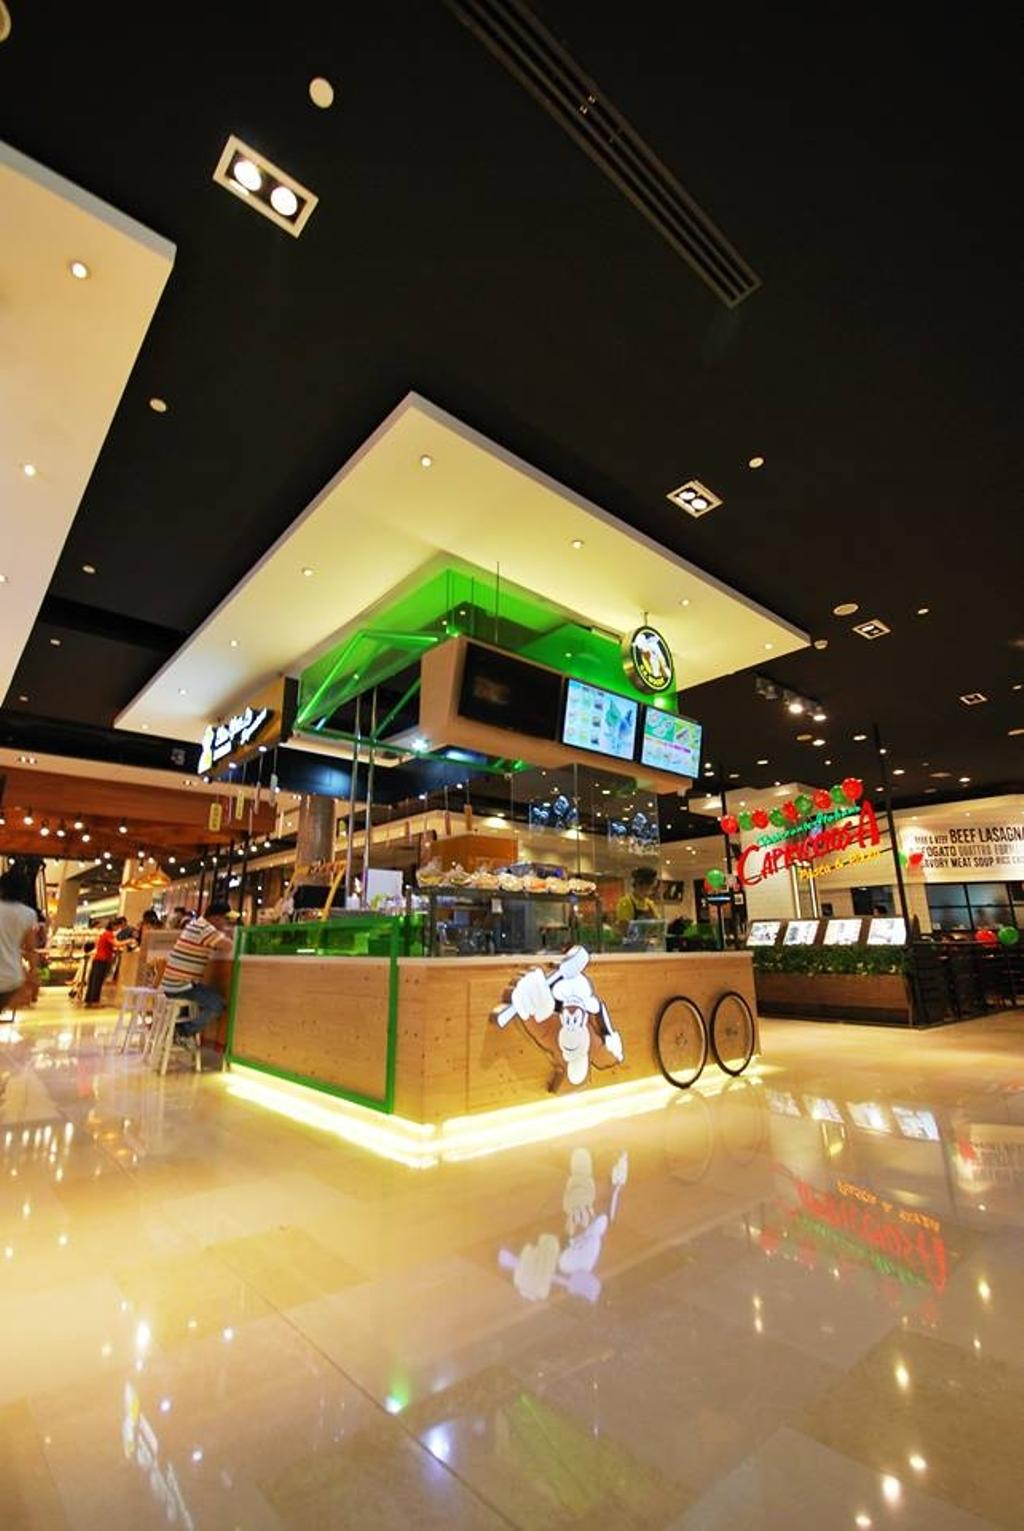 KK Woody, Commercial, Interior Designer, The Grid Studio, Traditional, Food, Food Court, Restaurant